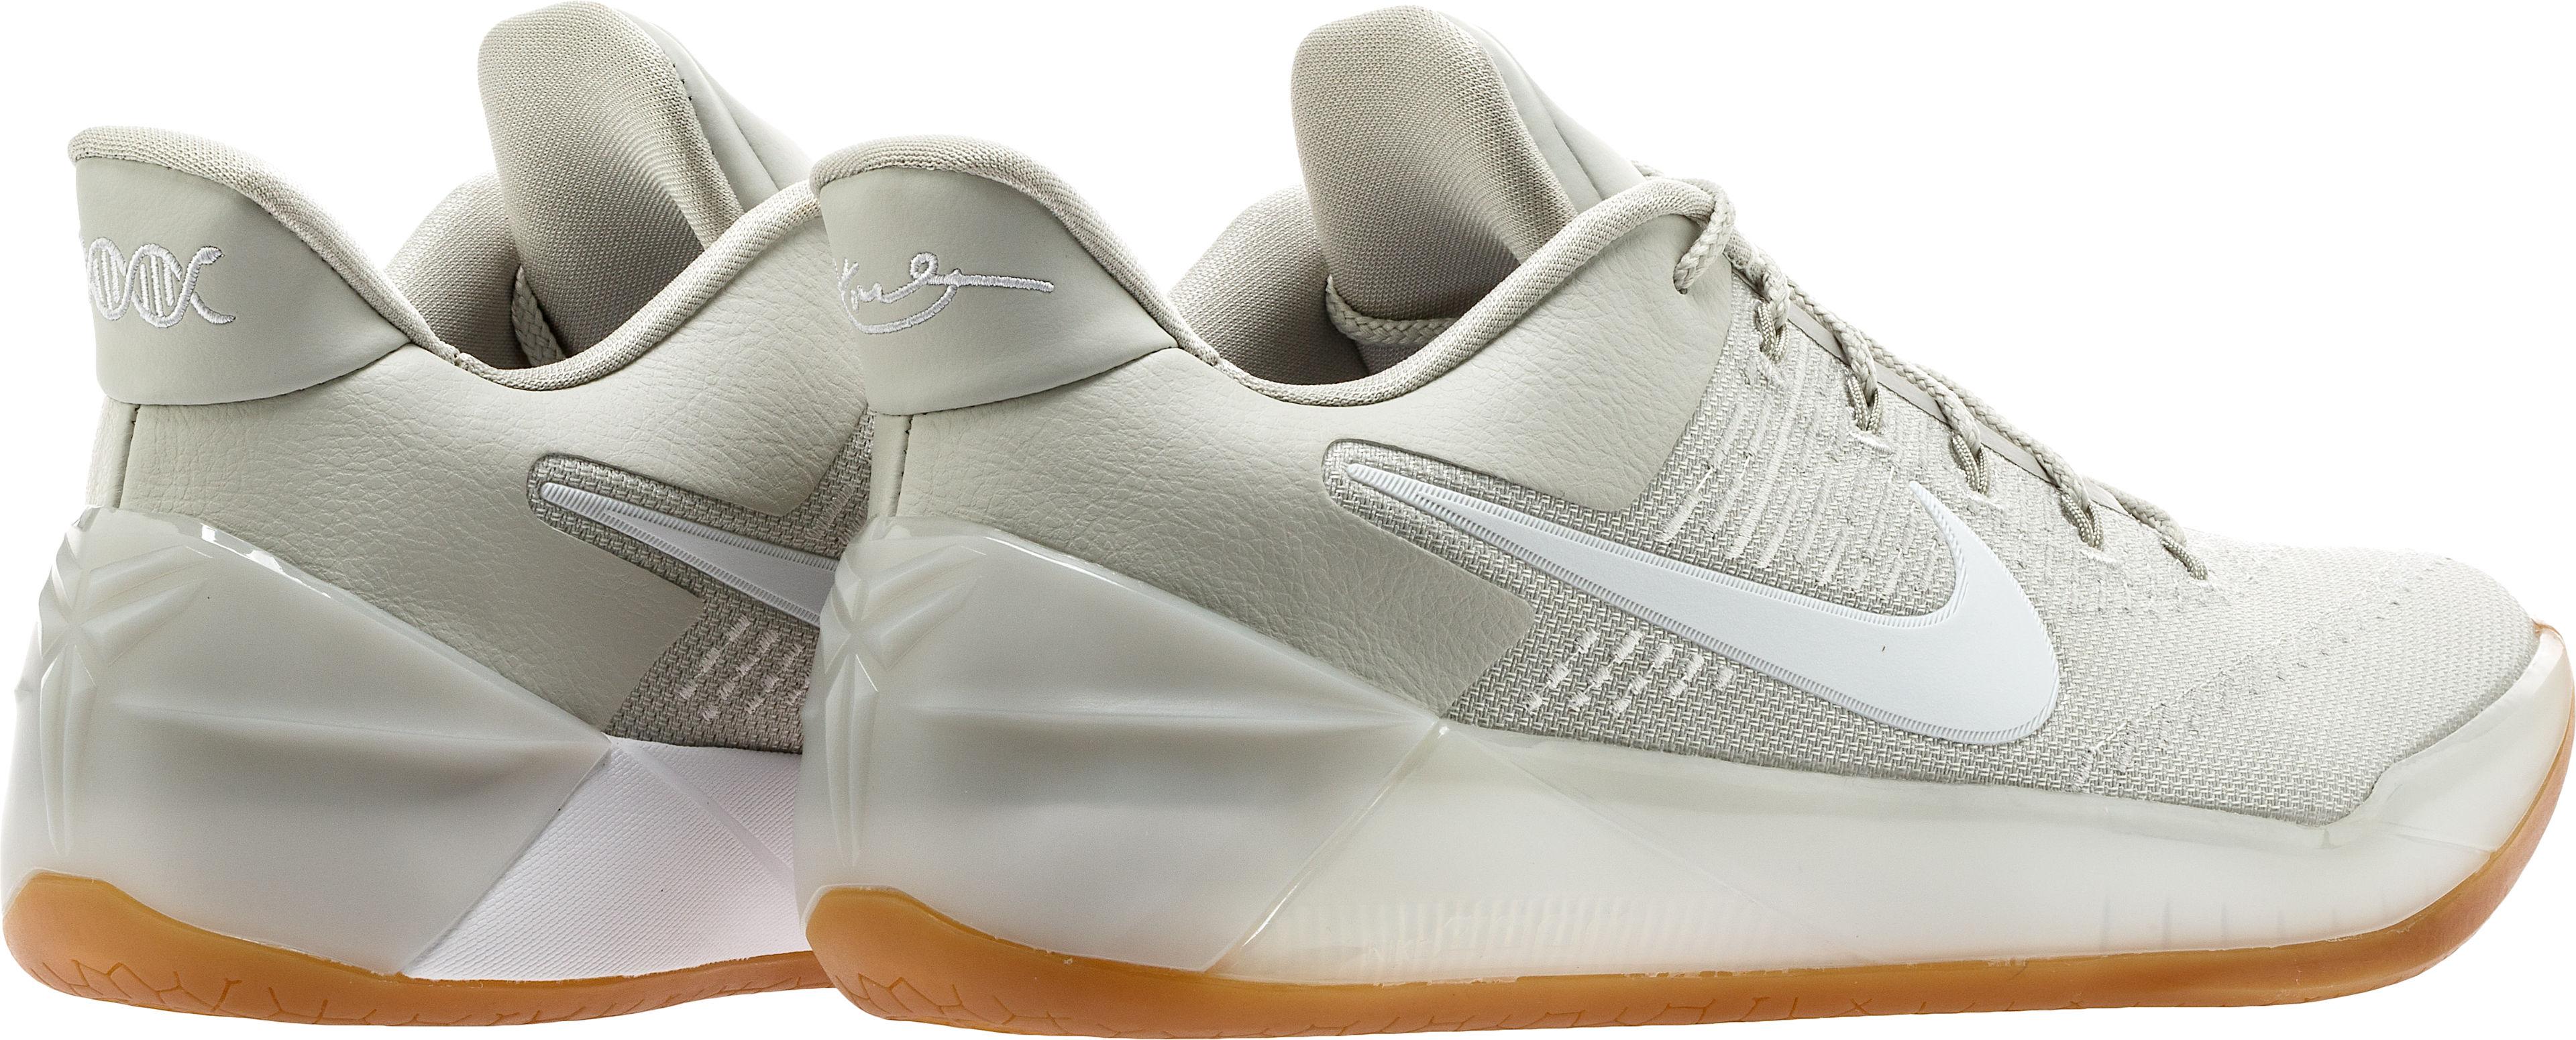 the latest 28f3f f45fe Nike Kobe AD Light Bone 852425 011 3